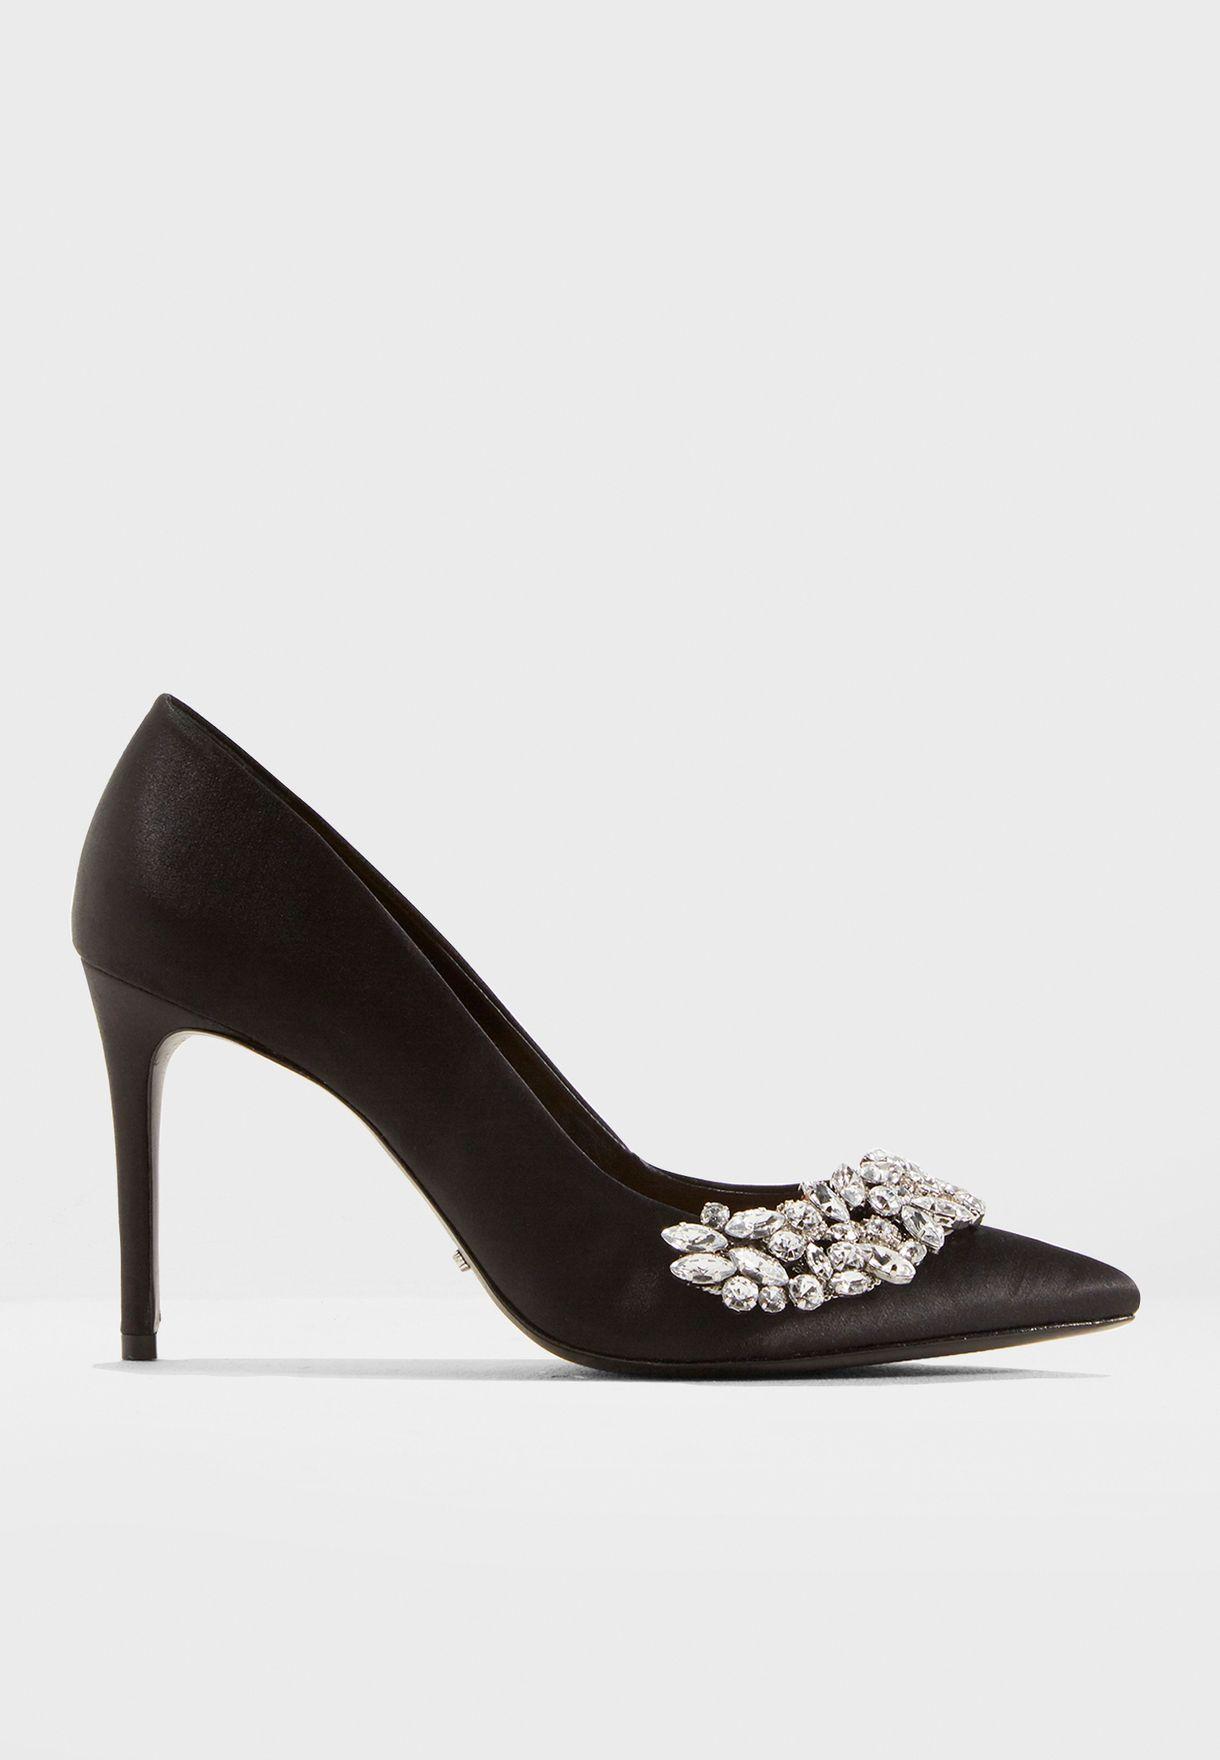 16171067b582 Shop schutz black casual high heel pumps for women in saudi lrv jpg  1220x1760 Schutz black